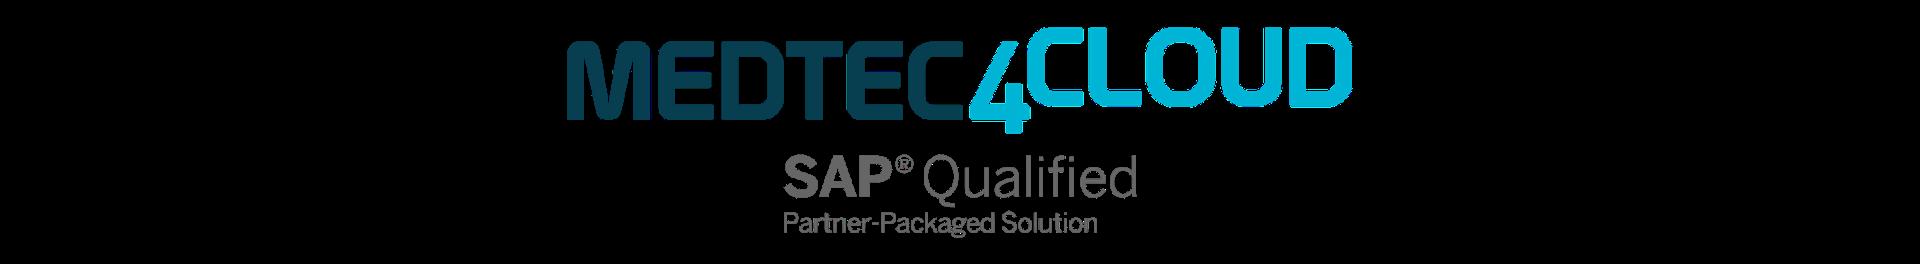 Cloud ERP SAP Business ByDesign medtec4cloud Medizintechnik Prozessoptimierung